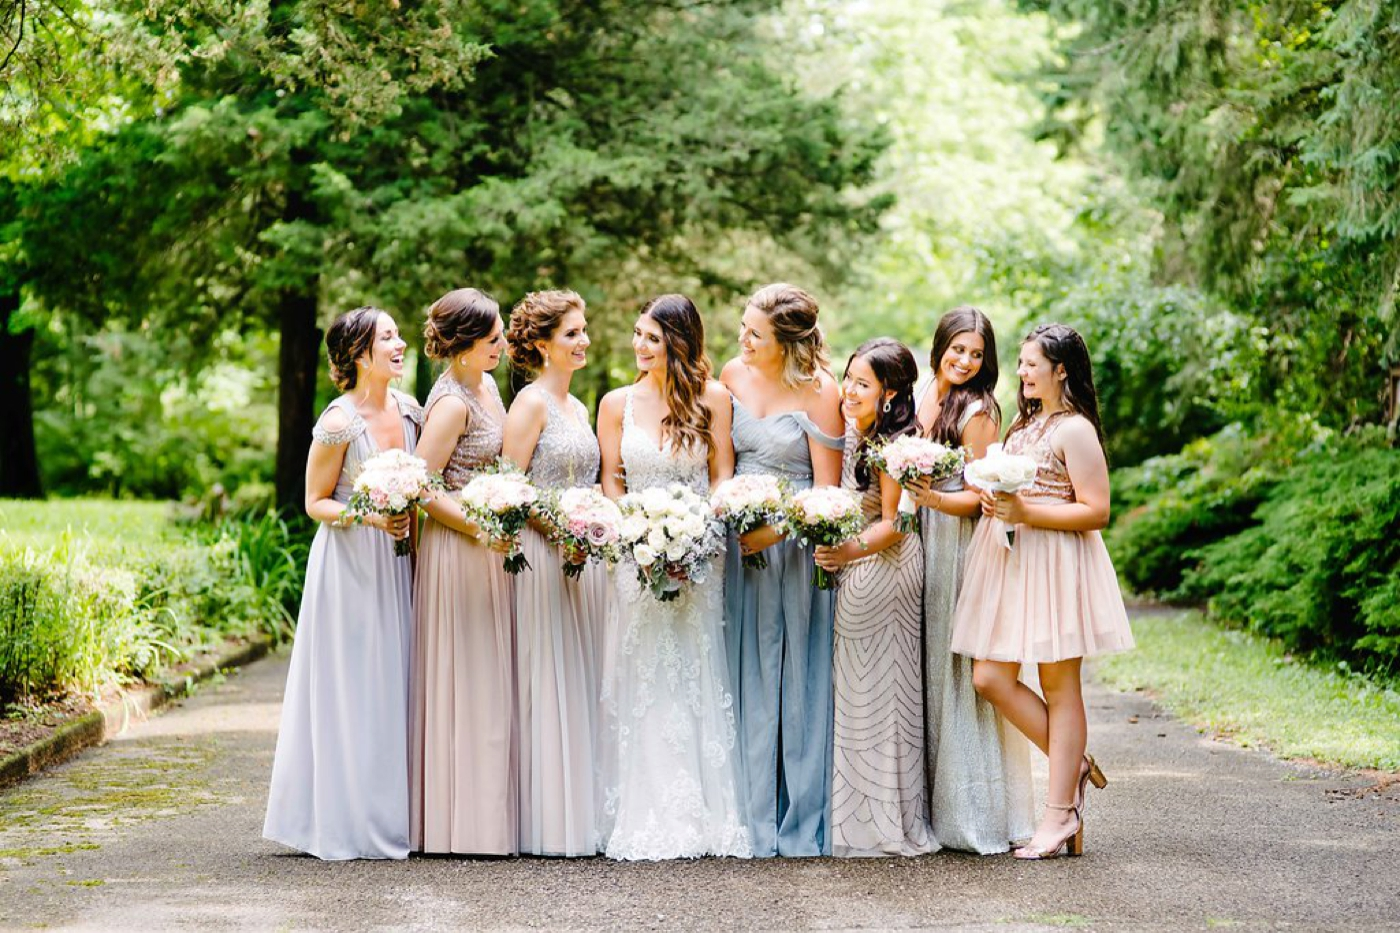 chicago-fine-art-wedding-photography-duncan53